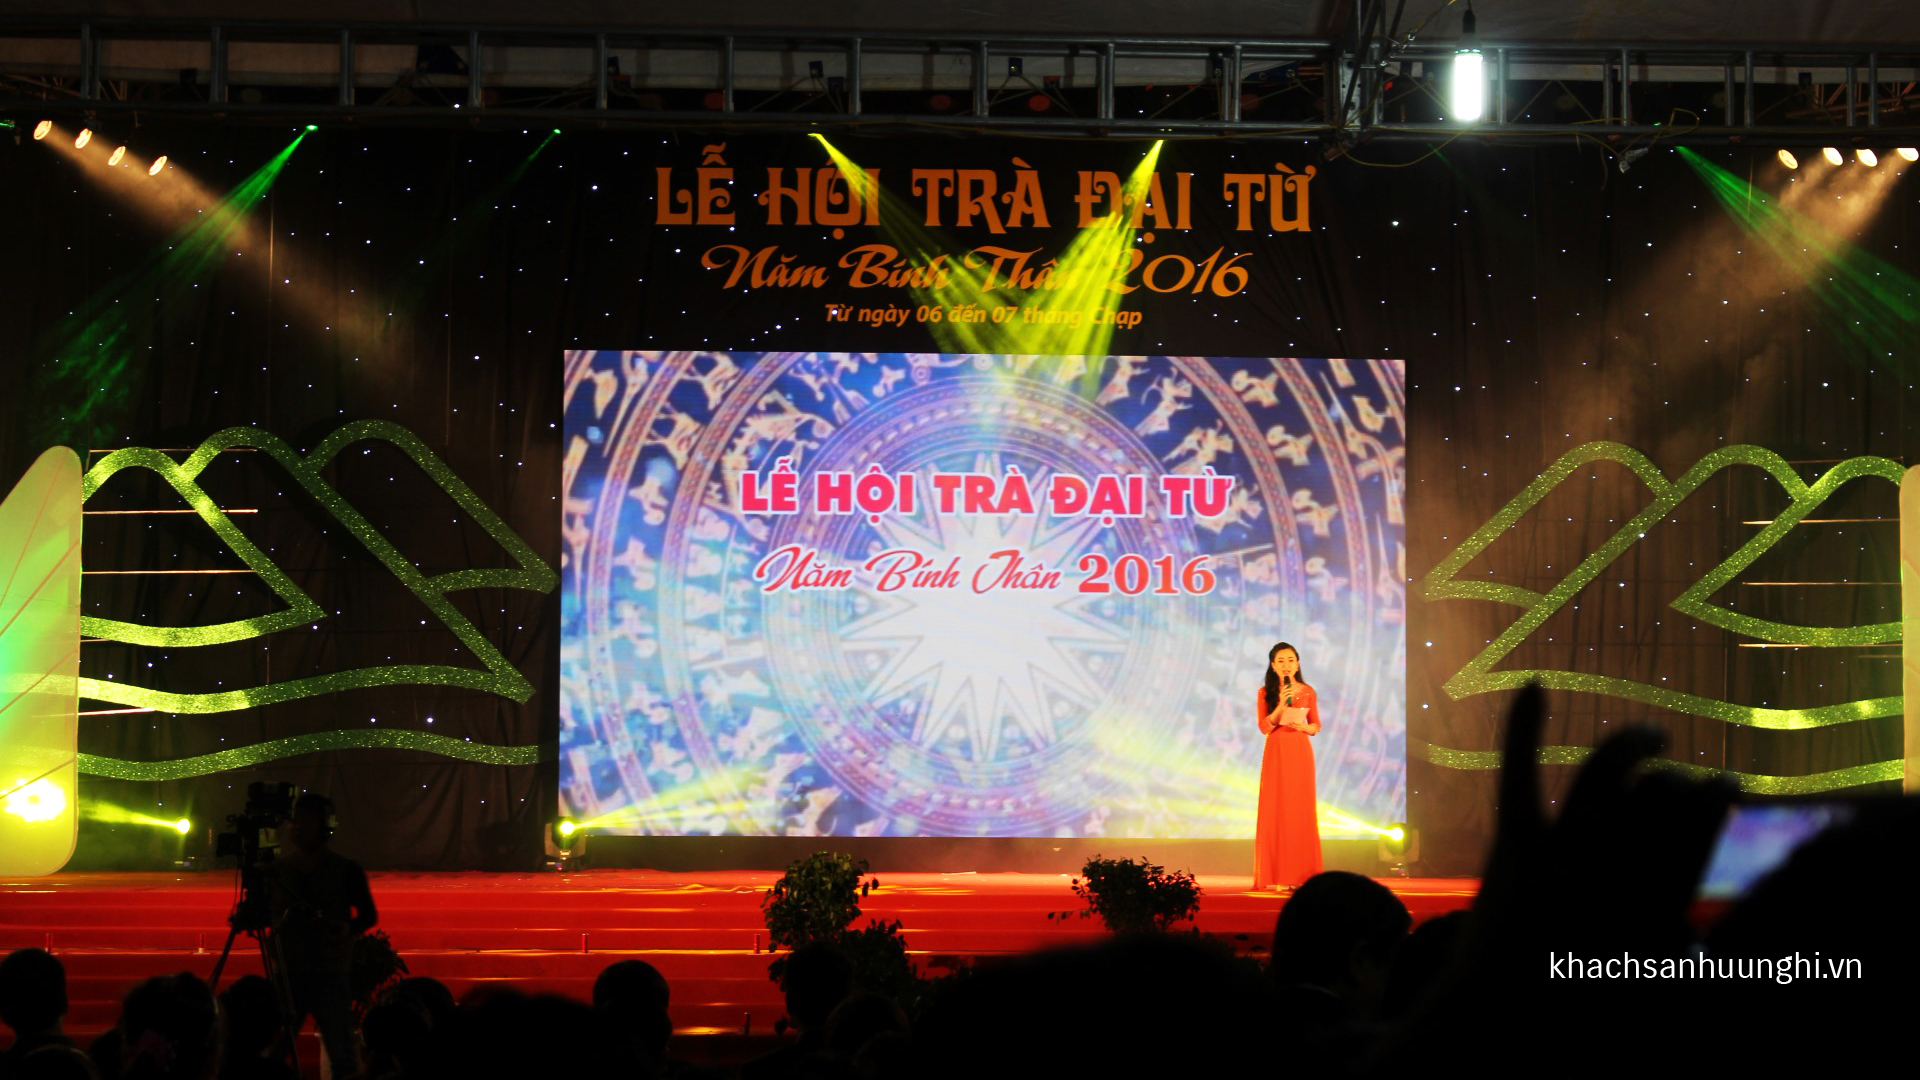 Le hoi tra Dai tu Thai Nguyen 2016 (1)